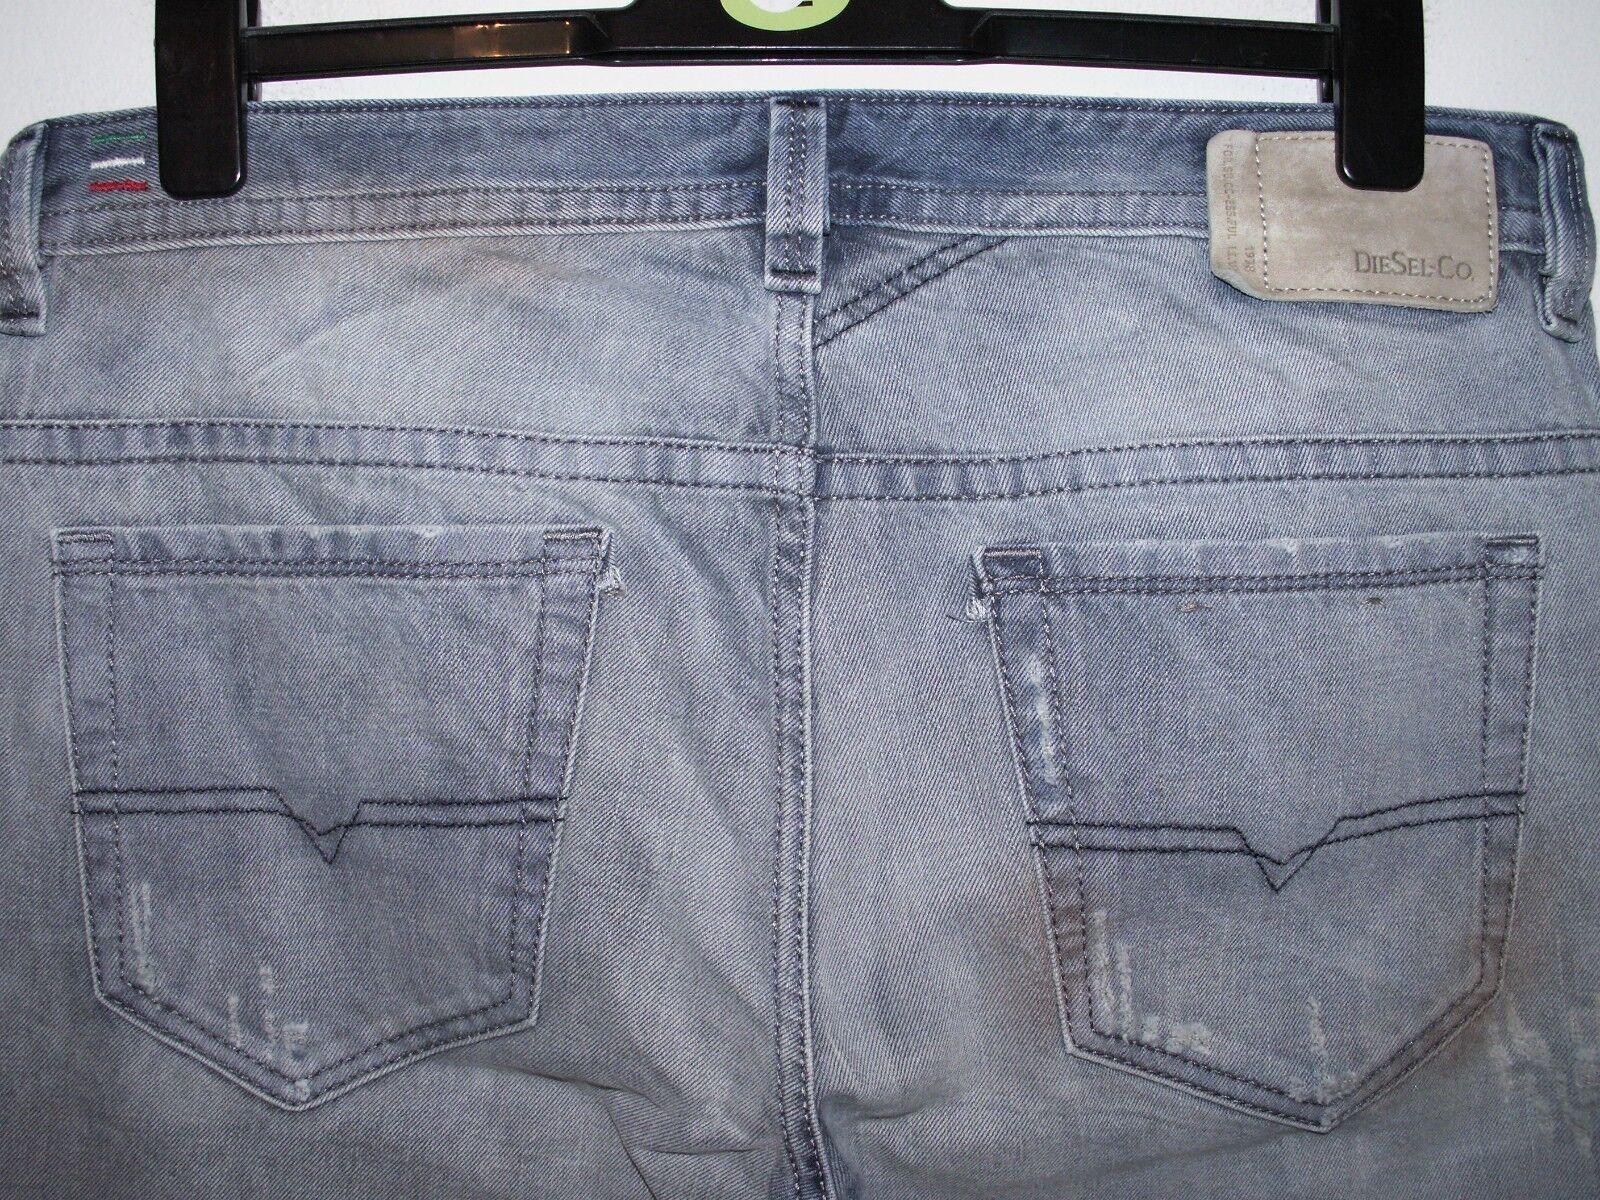 Diesel Thavar Slim-Skinny Jeans Fit 0827W W33 L32  (4839)  promociones de equipo